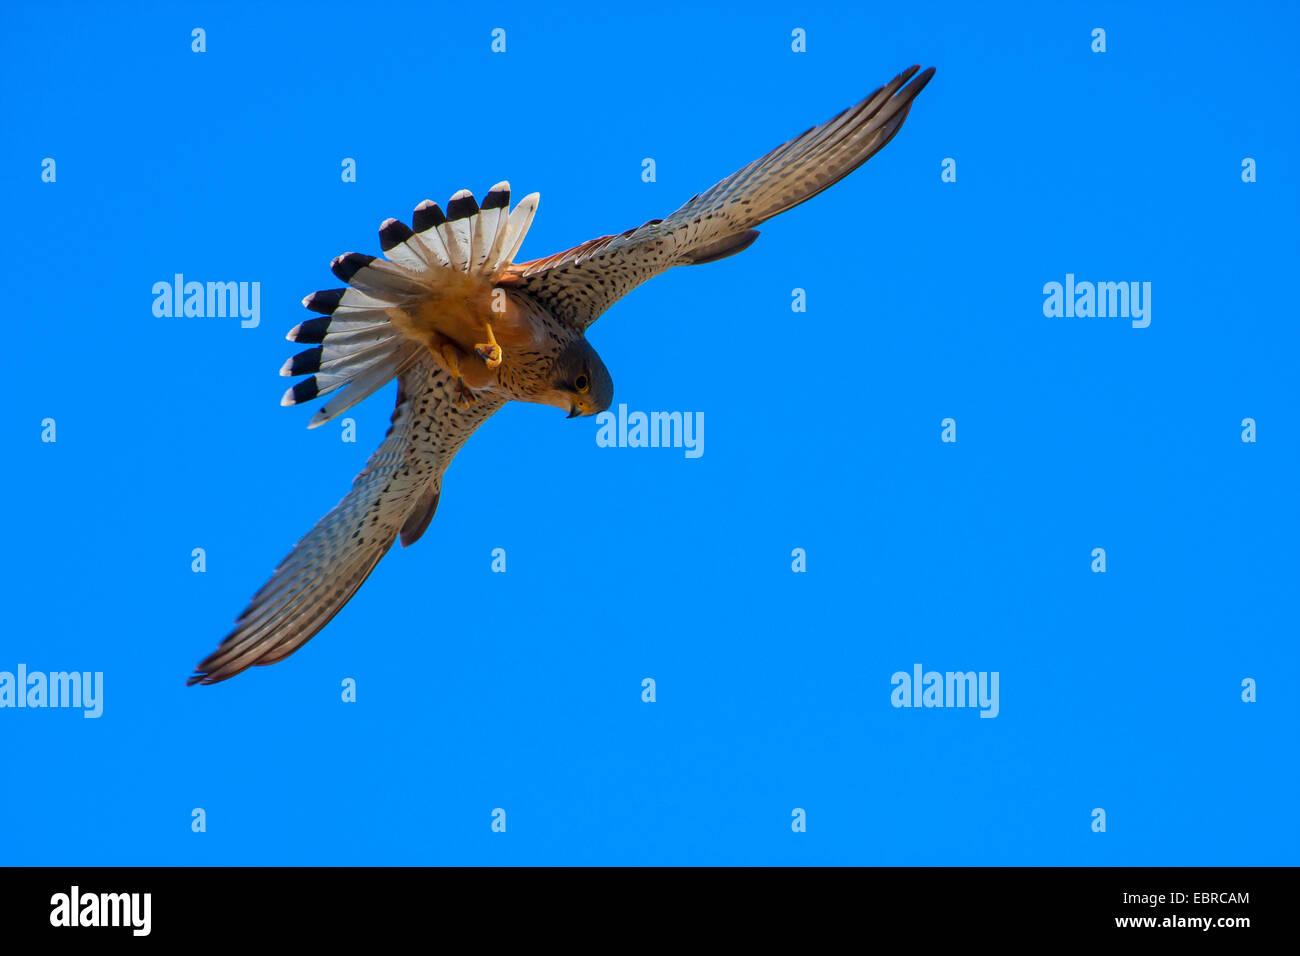 European Kestrel, Eurasian Kestrel, Old World Kestrel, Common Kestrel (Falco tinnunculus), in flight, Switzerland, - Stock Image